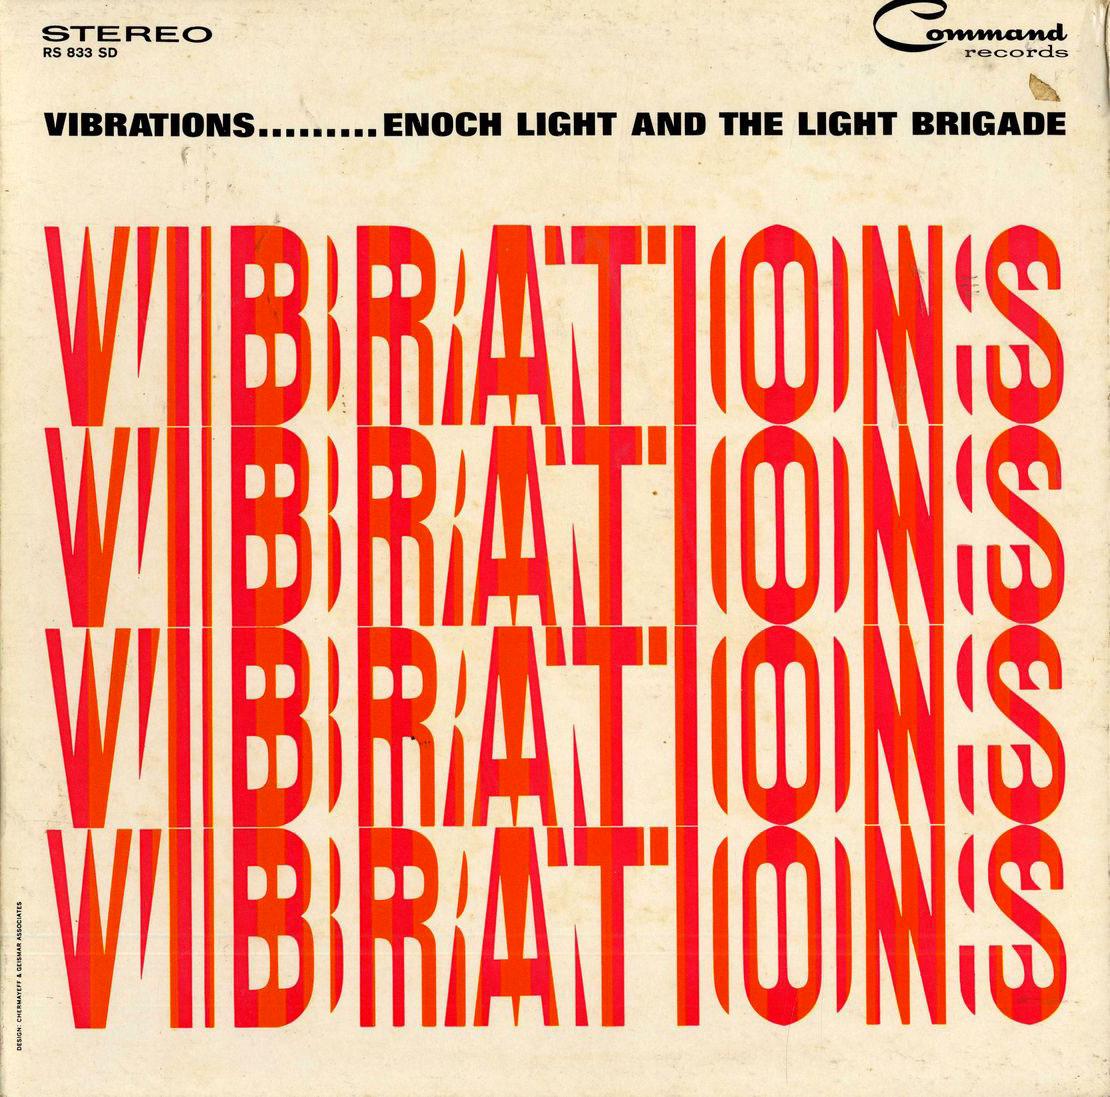 Chermayeff-and-Geismar-vibrations-1962